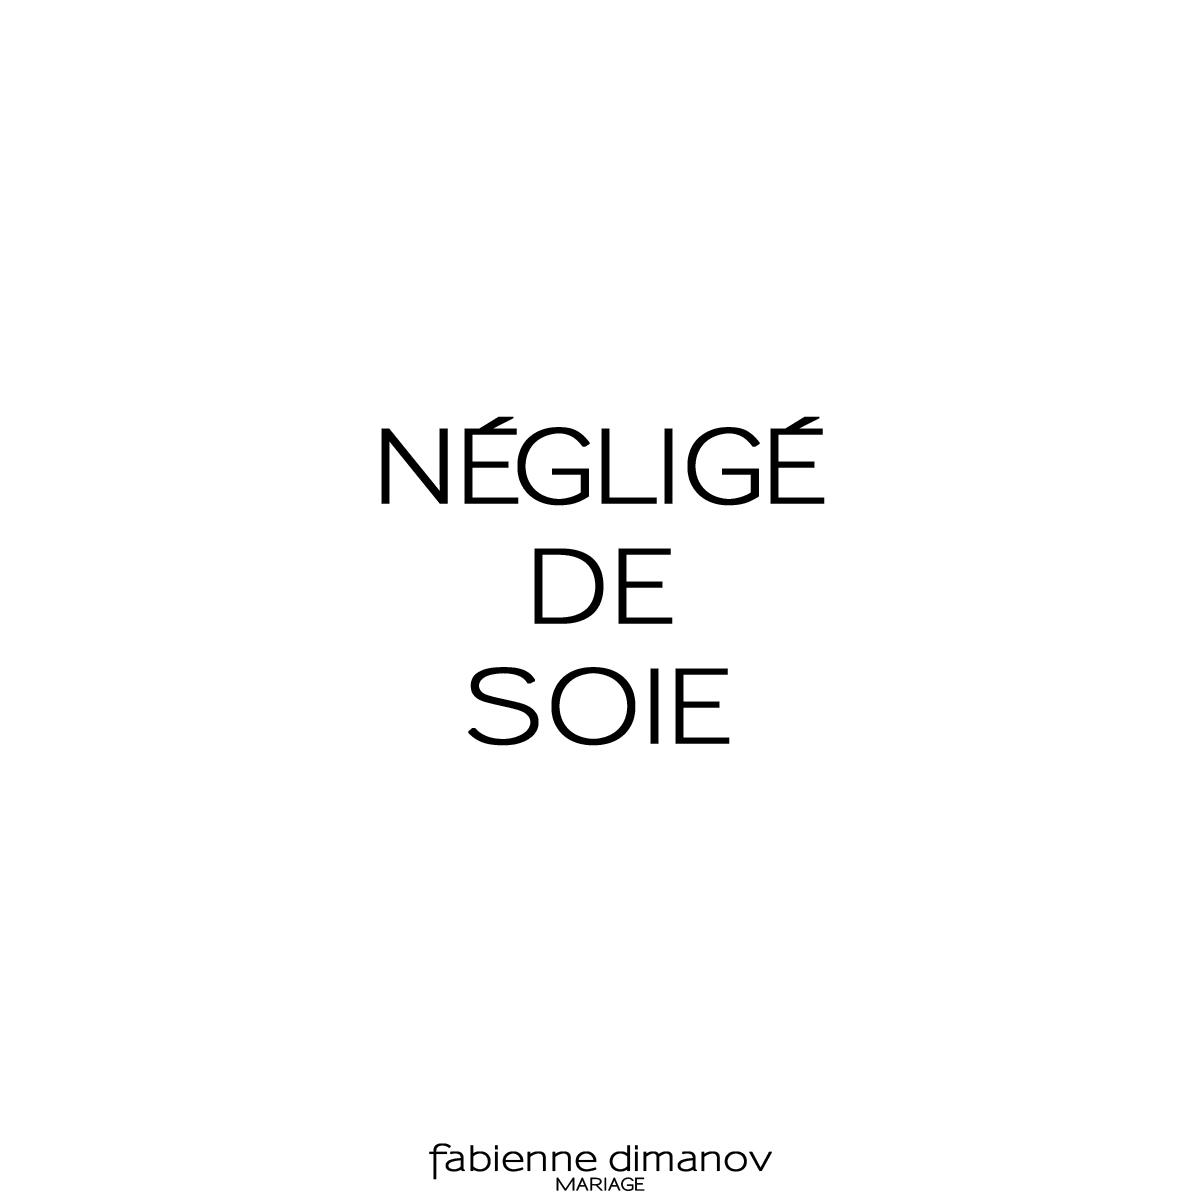 NEGLIGE DE SOIE - Fabienne Dimanov Mariage